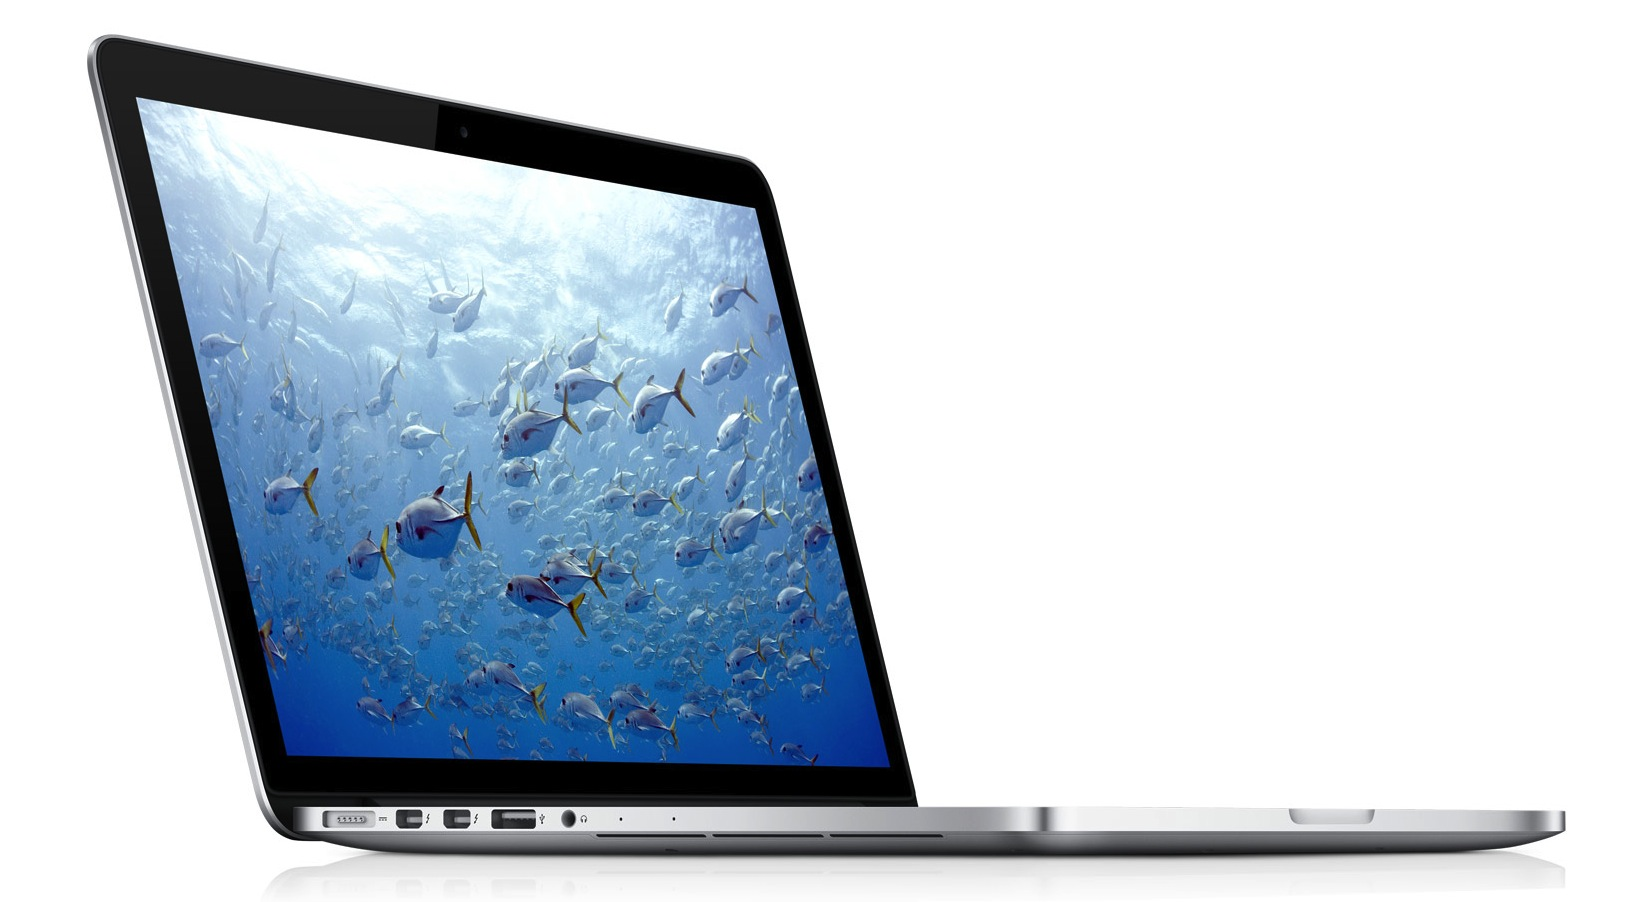 Macbook-Pro-13-inch-Retina.jpeg